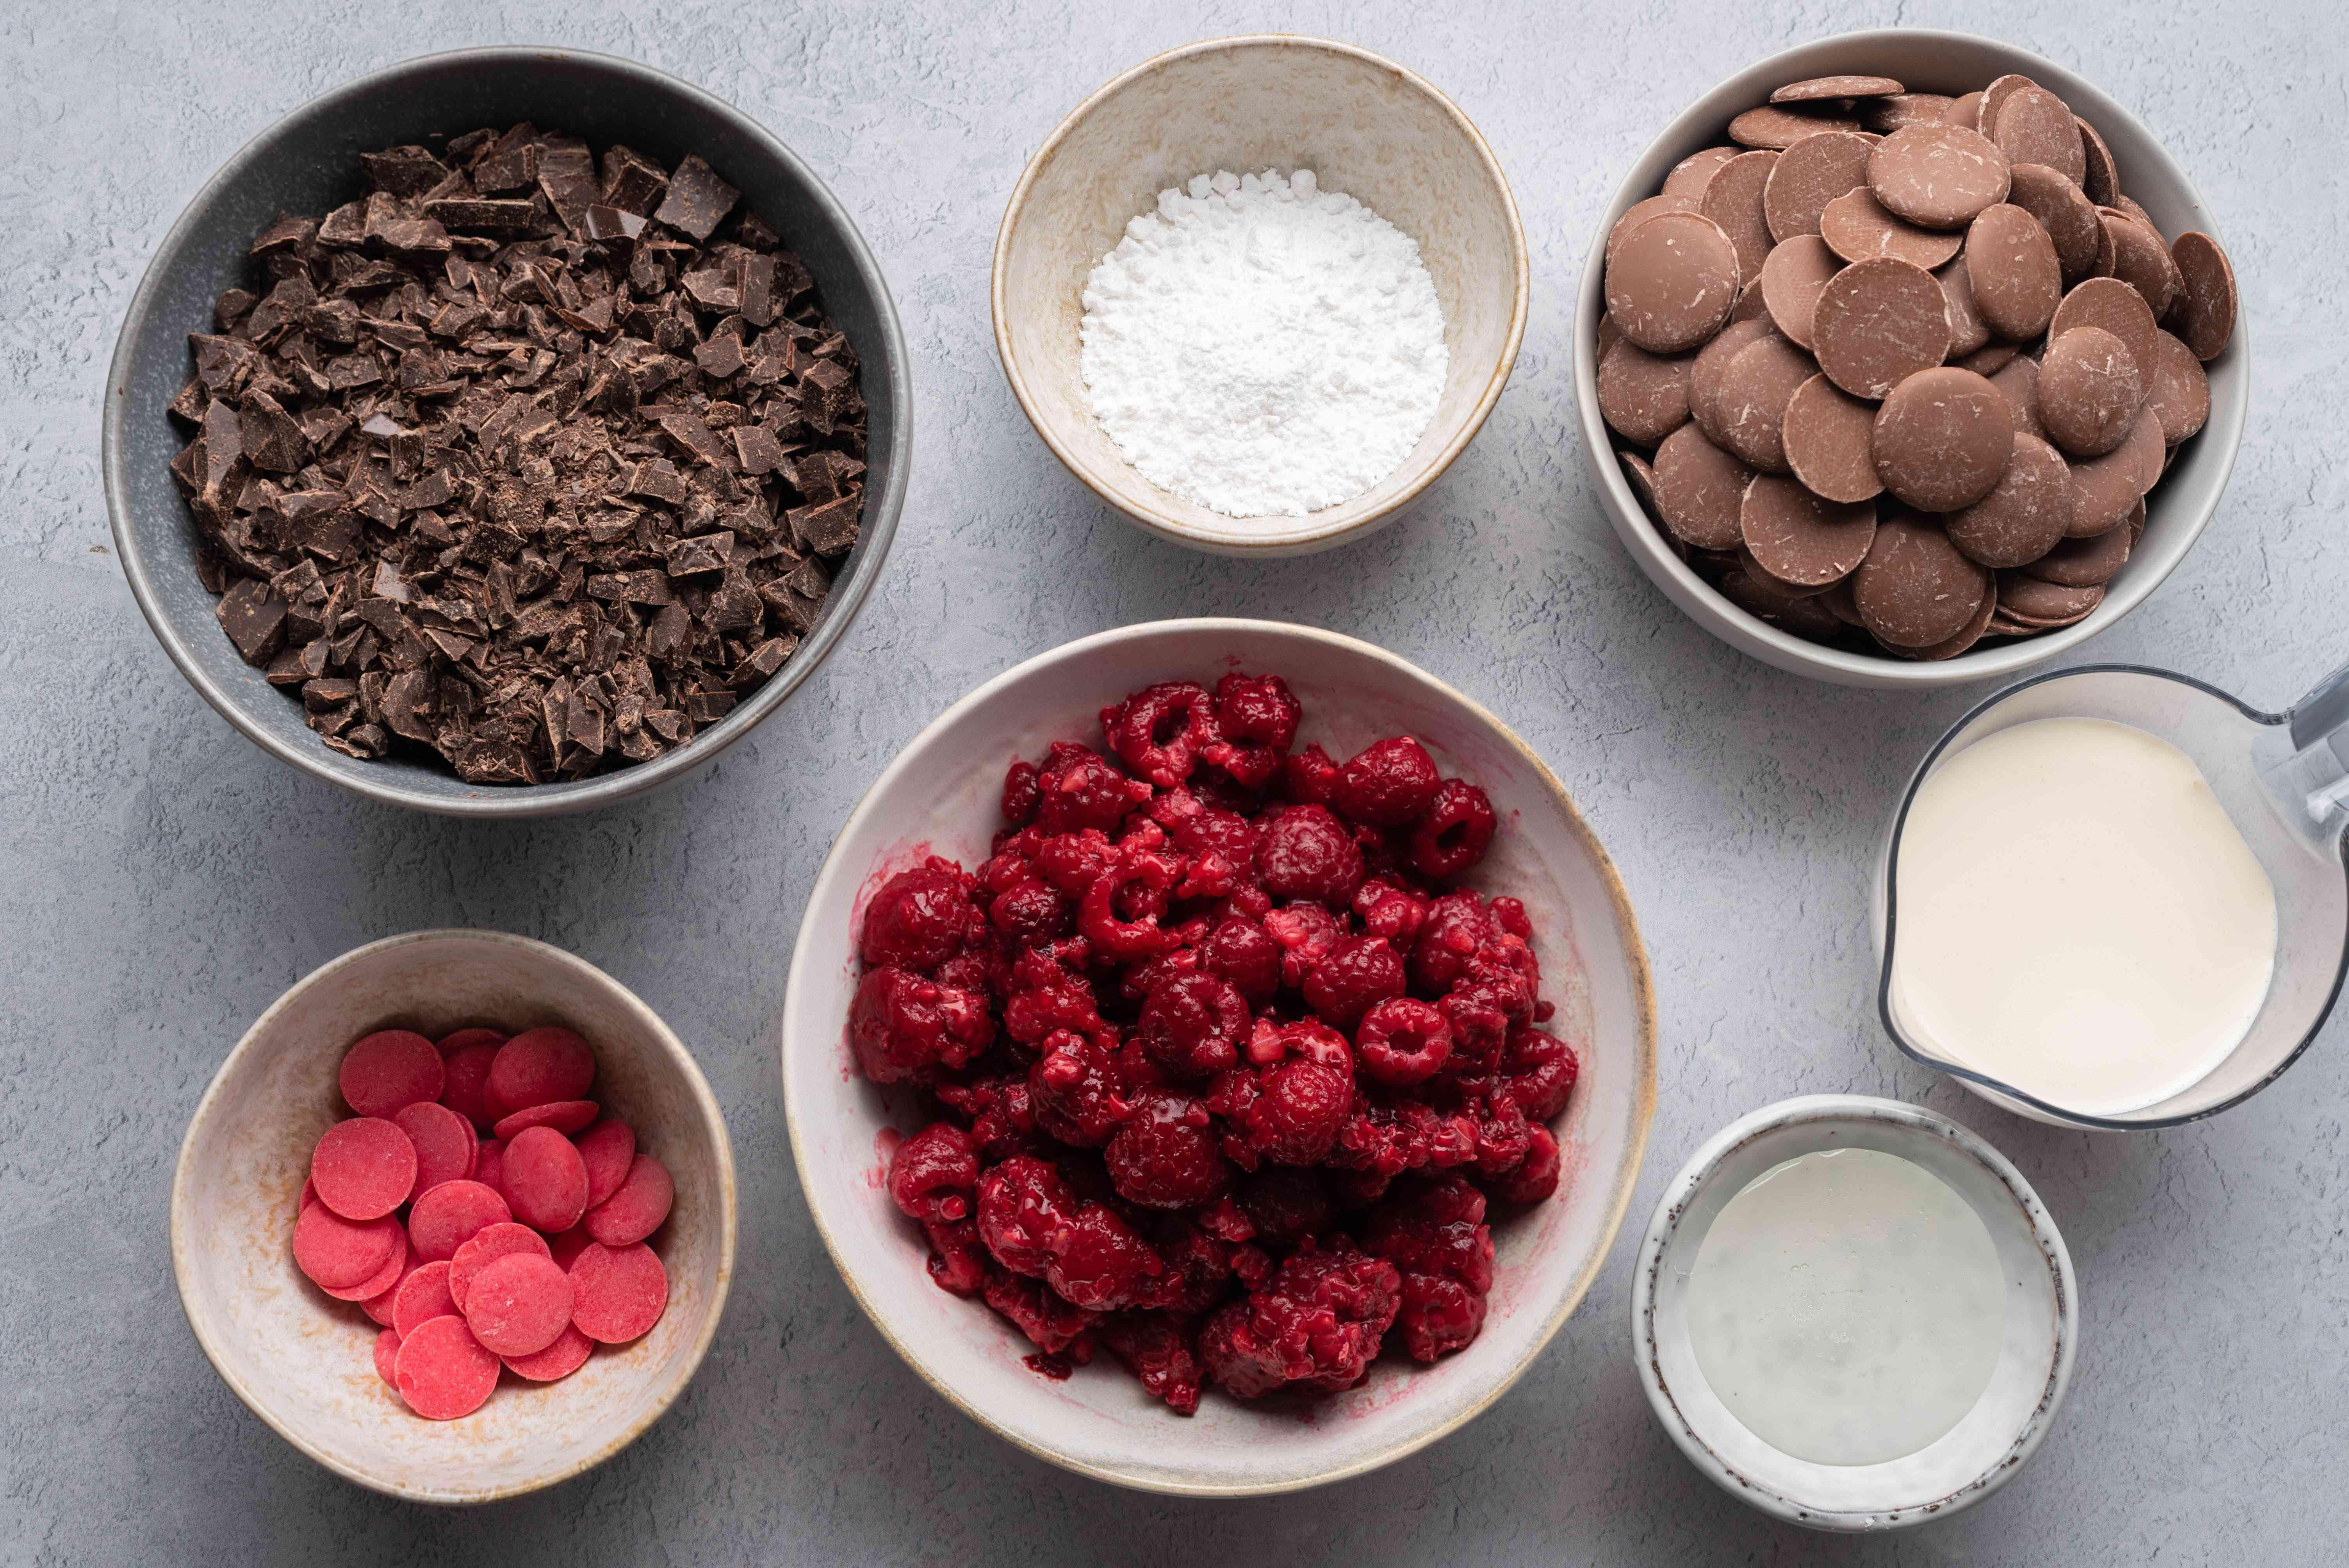 Chocolate Raspberry Truffles ingredients